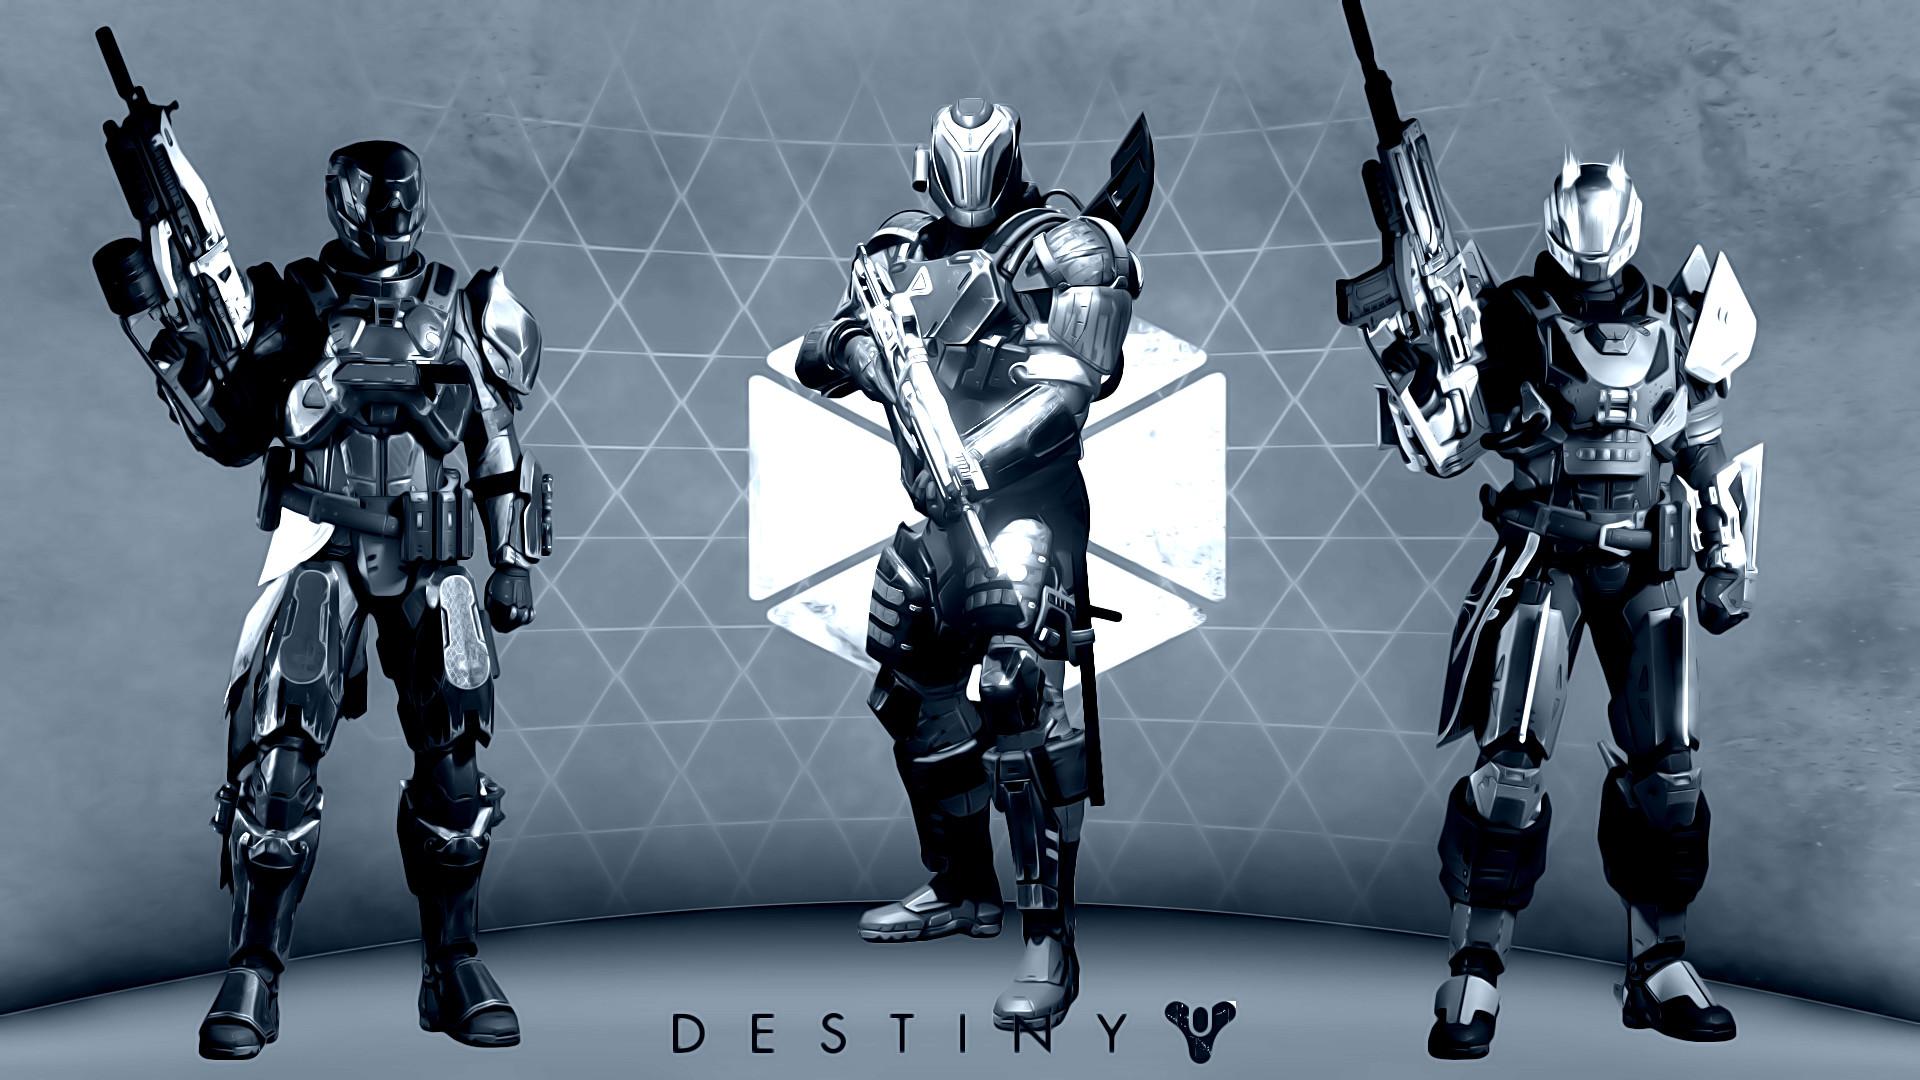 Destiny The Taken King Titan Wallpapers   HD Wallpapers